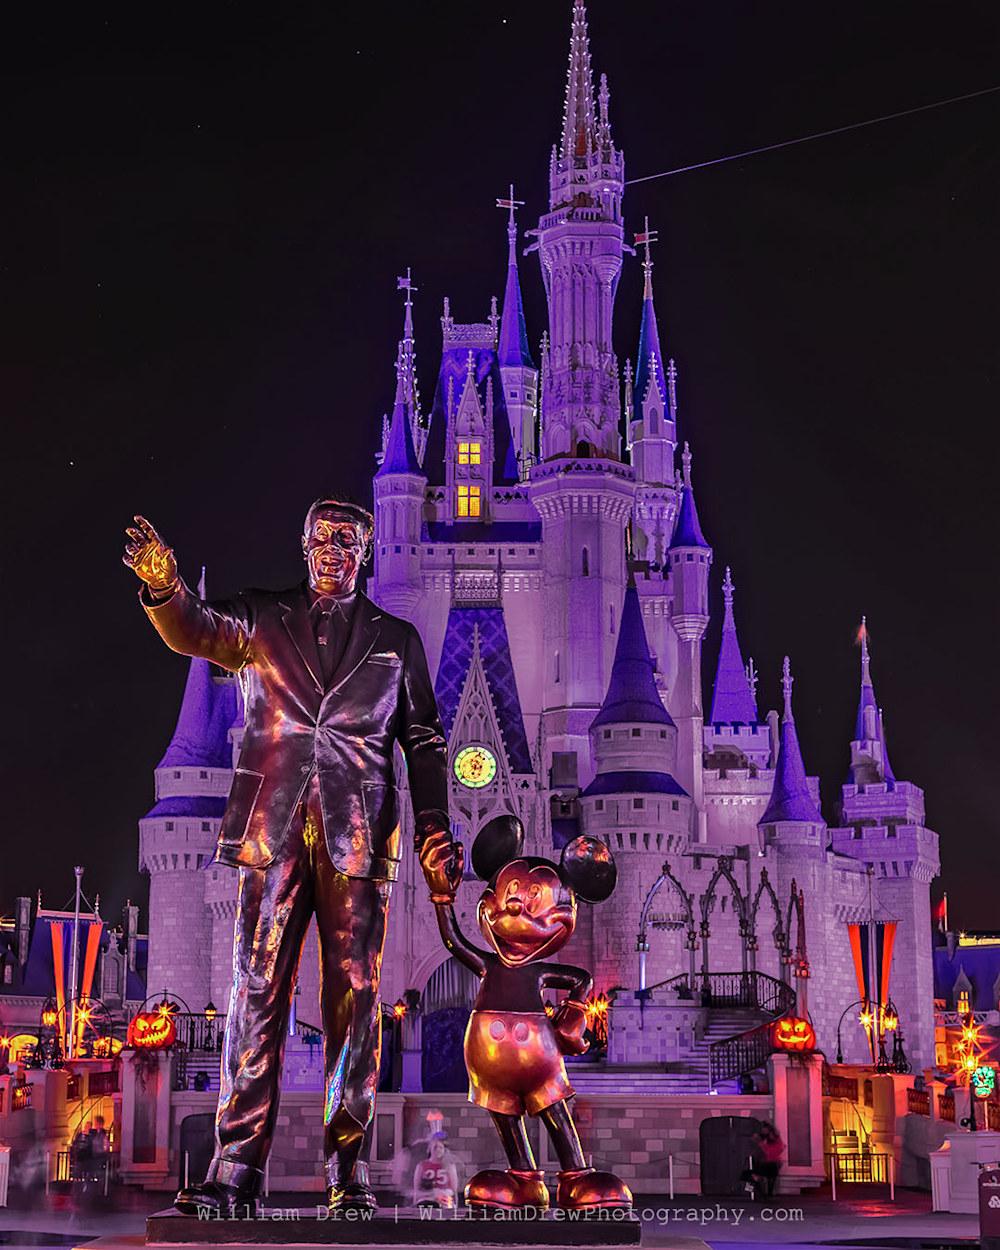 Halloween Partners - Disney Halloween Photos | William Drew Photography